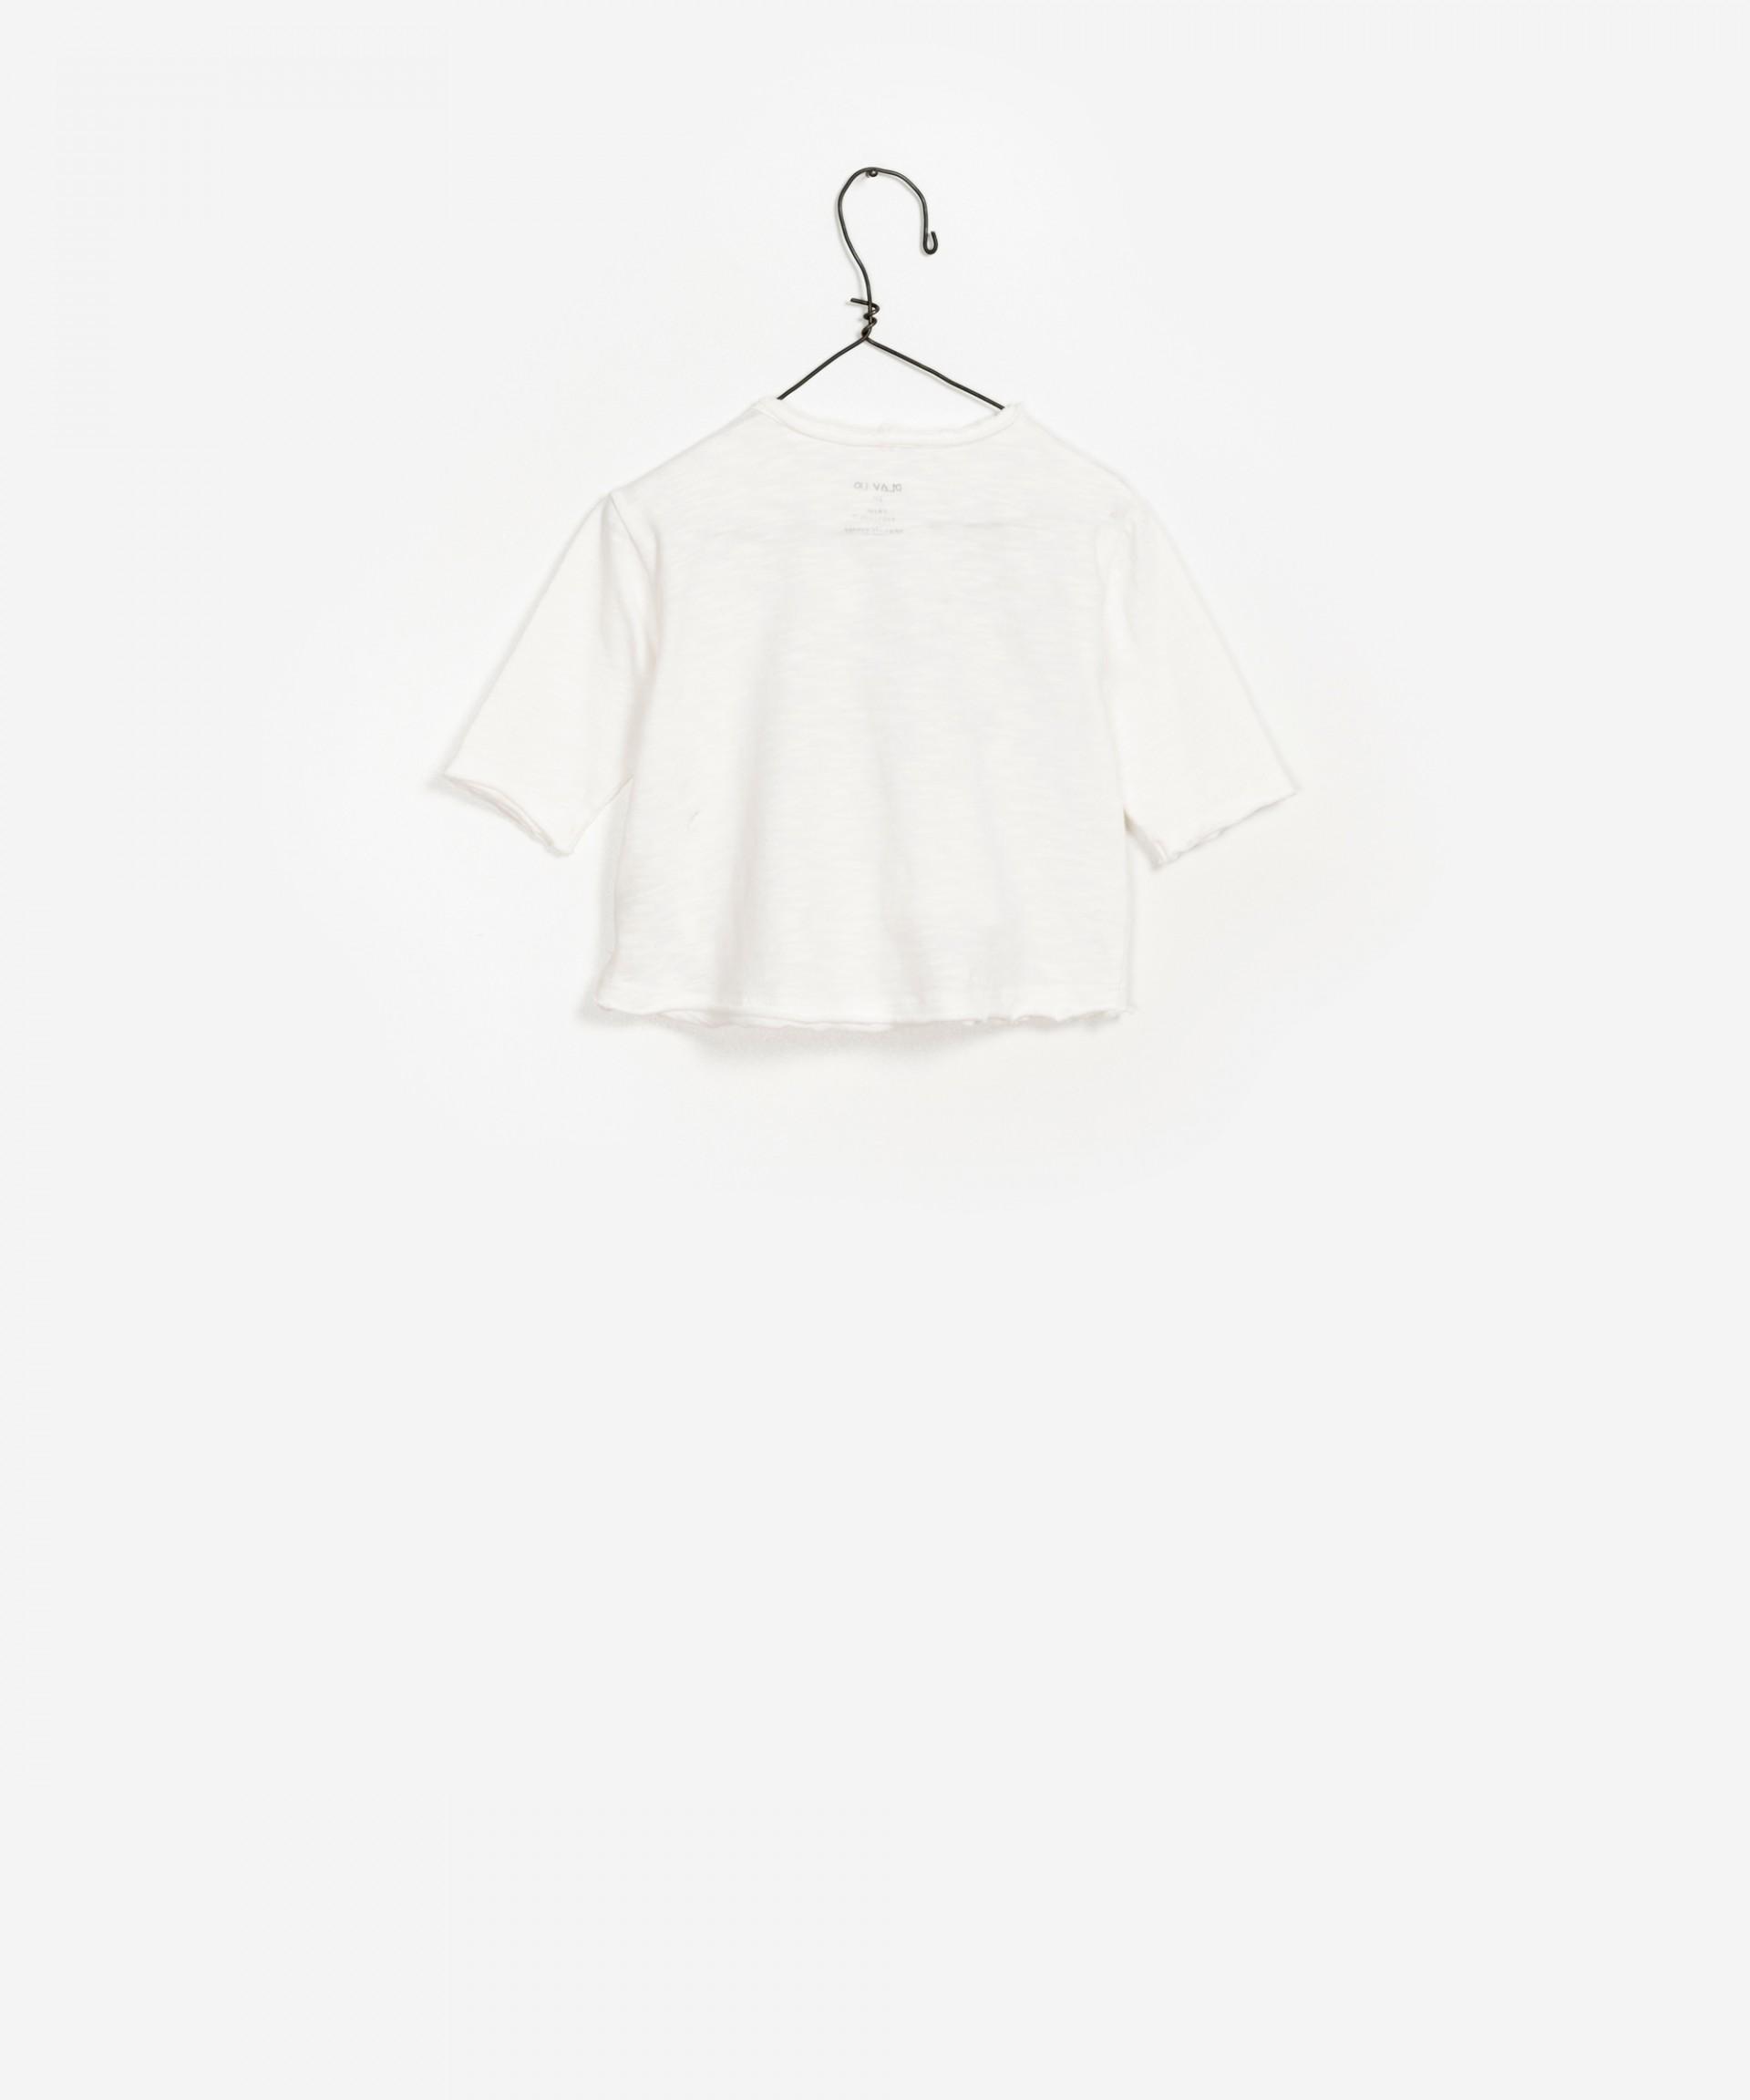 LS T-shirt Jersey Flamê 100% organic cotton